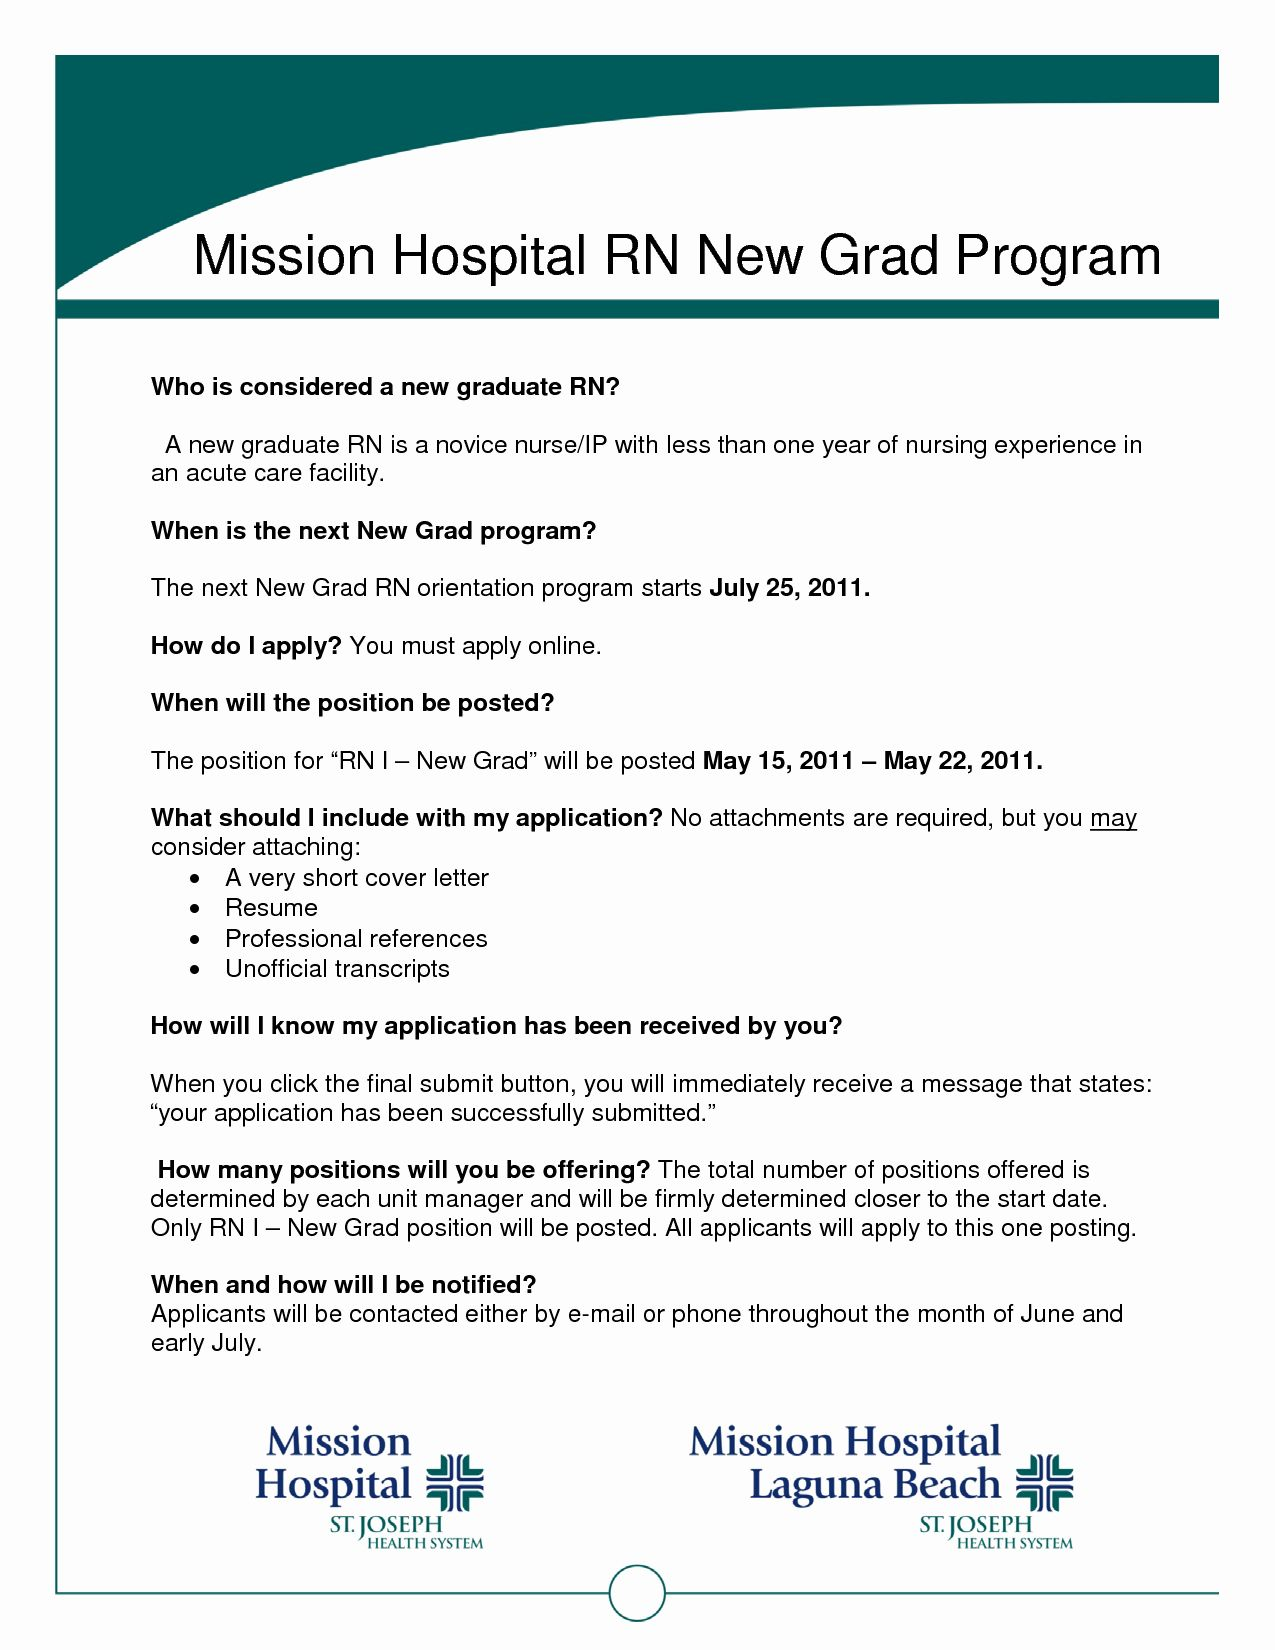 New Graduate Nurse Resume Examples Awesome Graduate Nurse Resume Template Resume Ideas Nursing Resume Examples Job Resume Examples Resume Examples